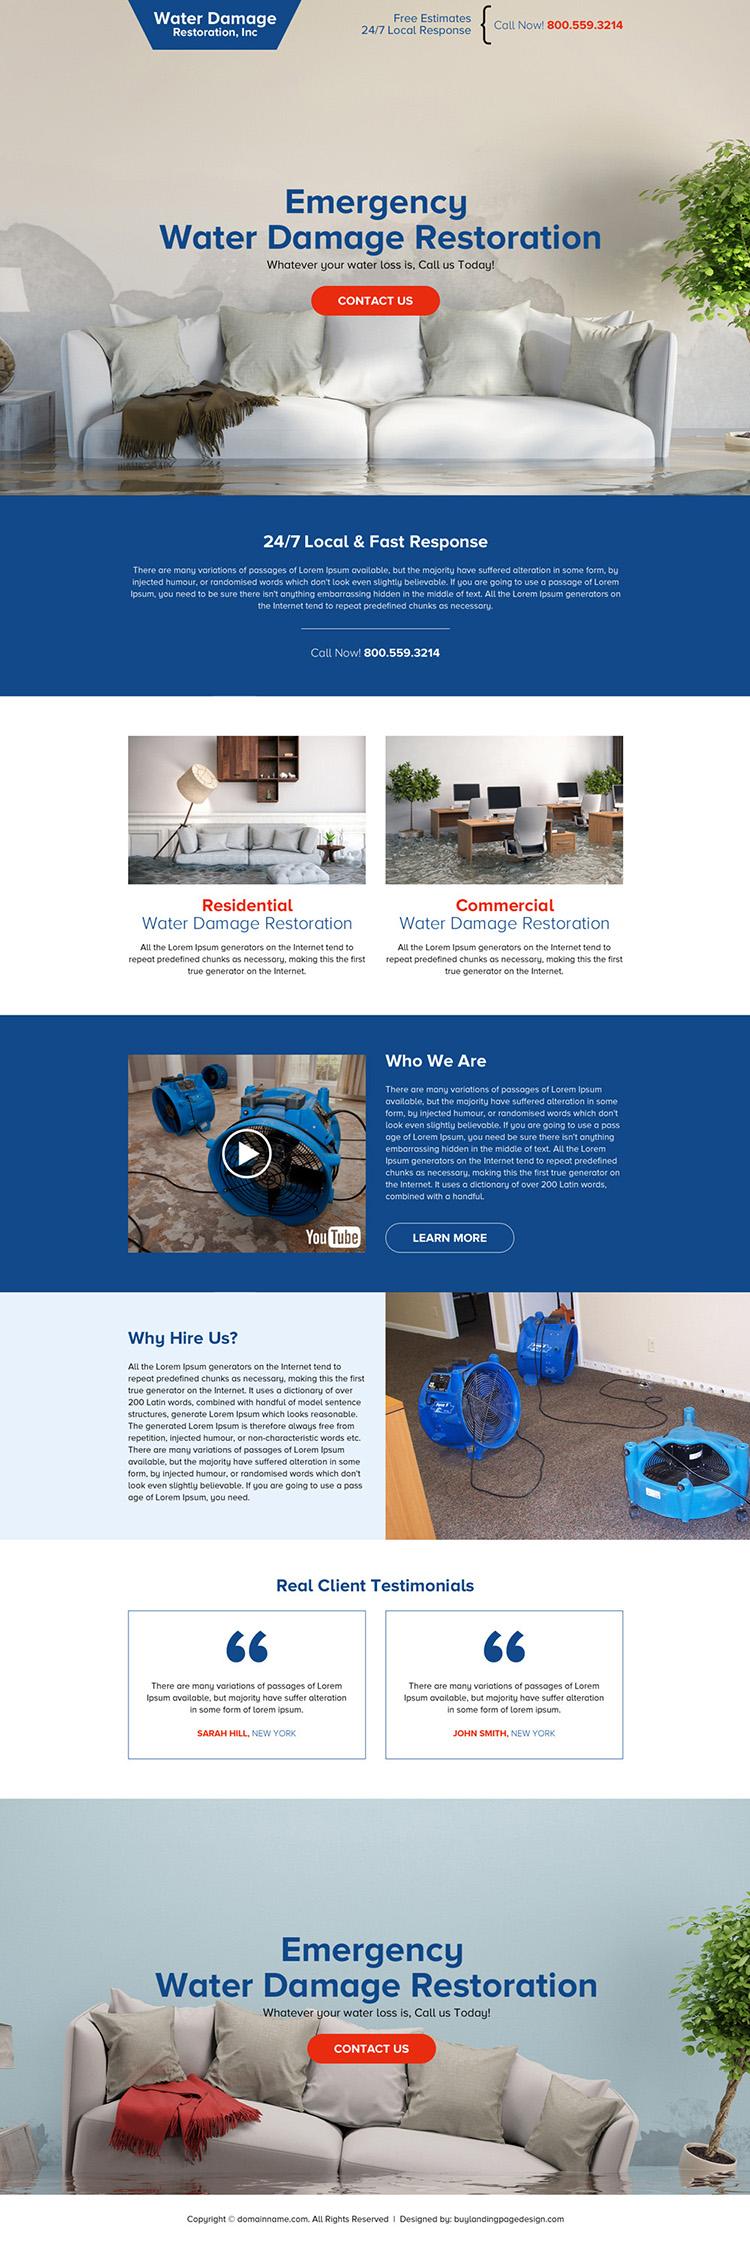 water damage restoration service responsive landing page